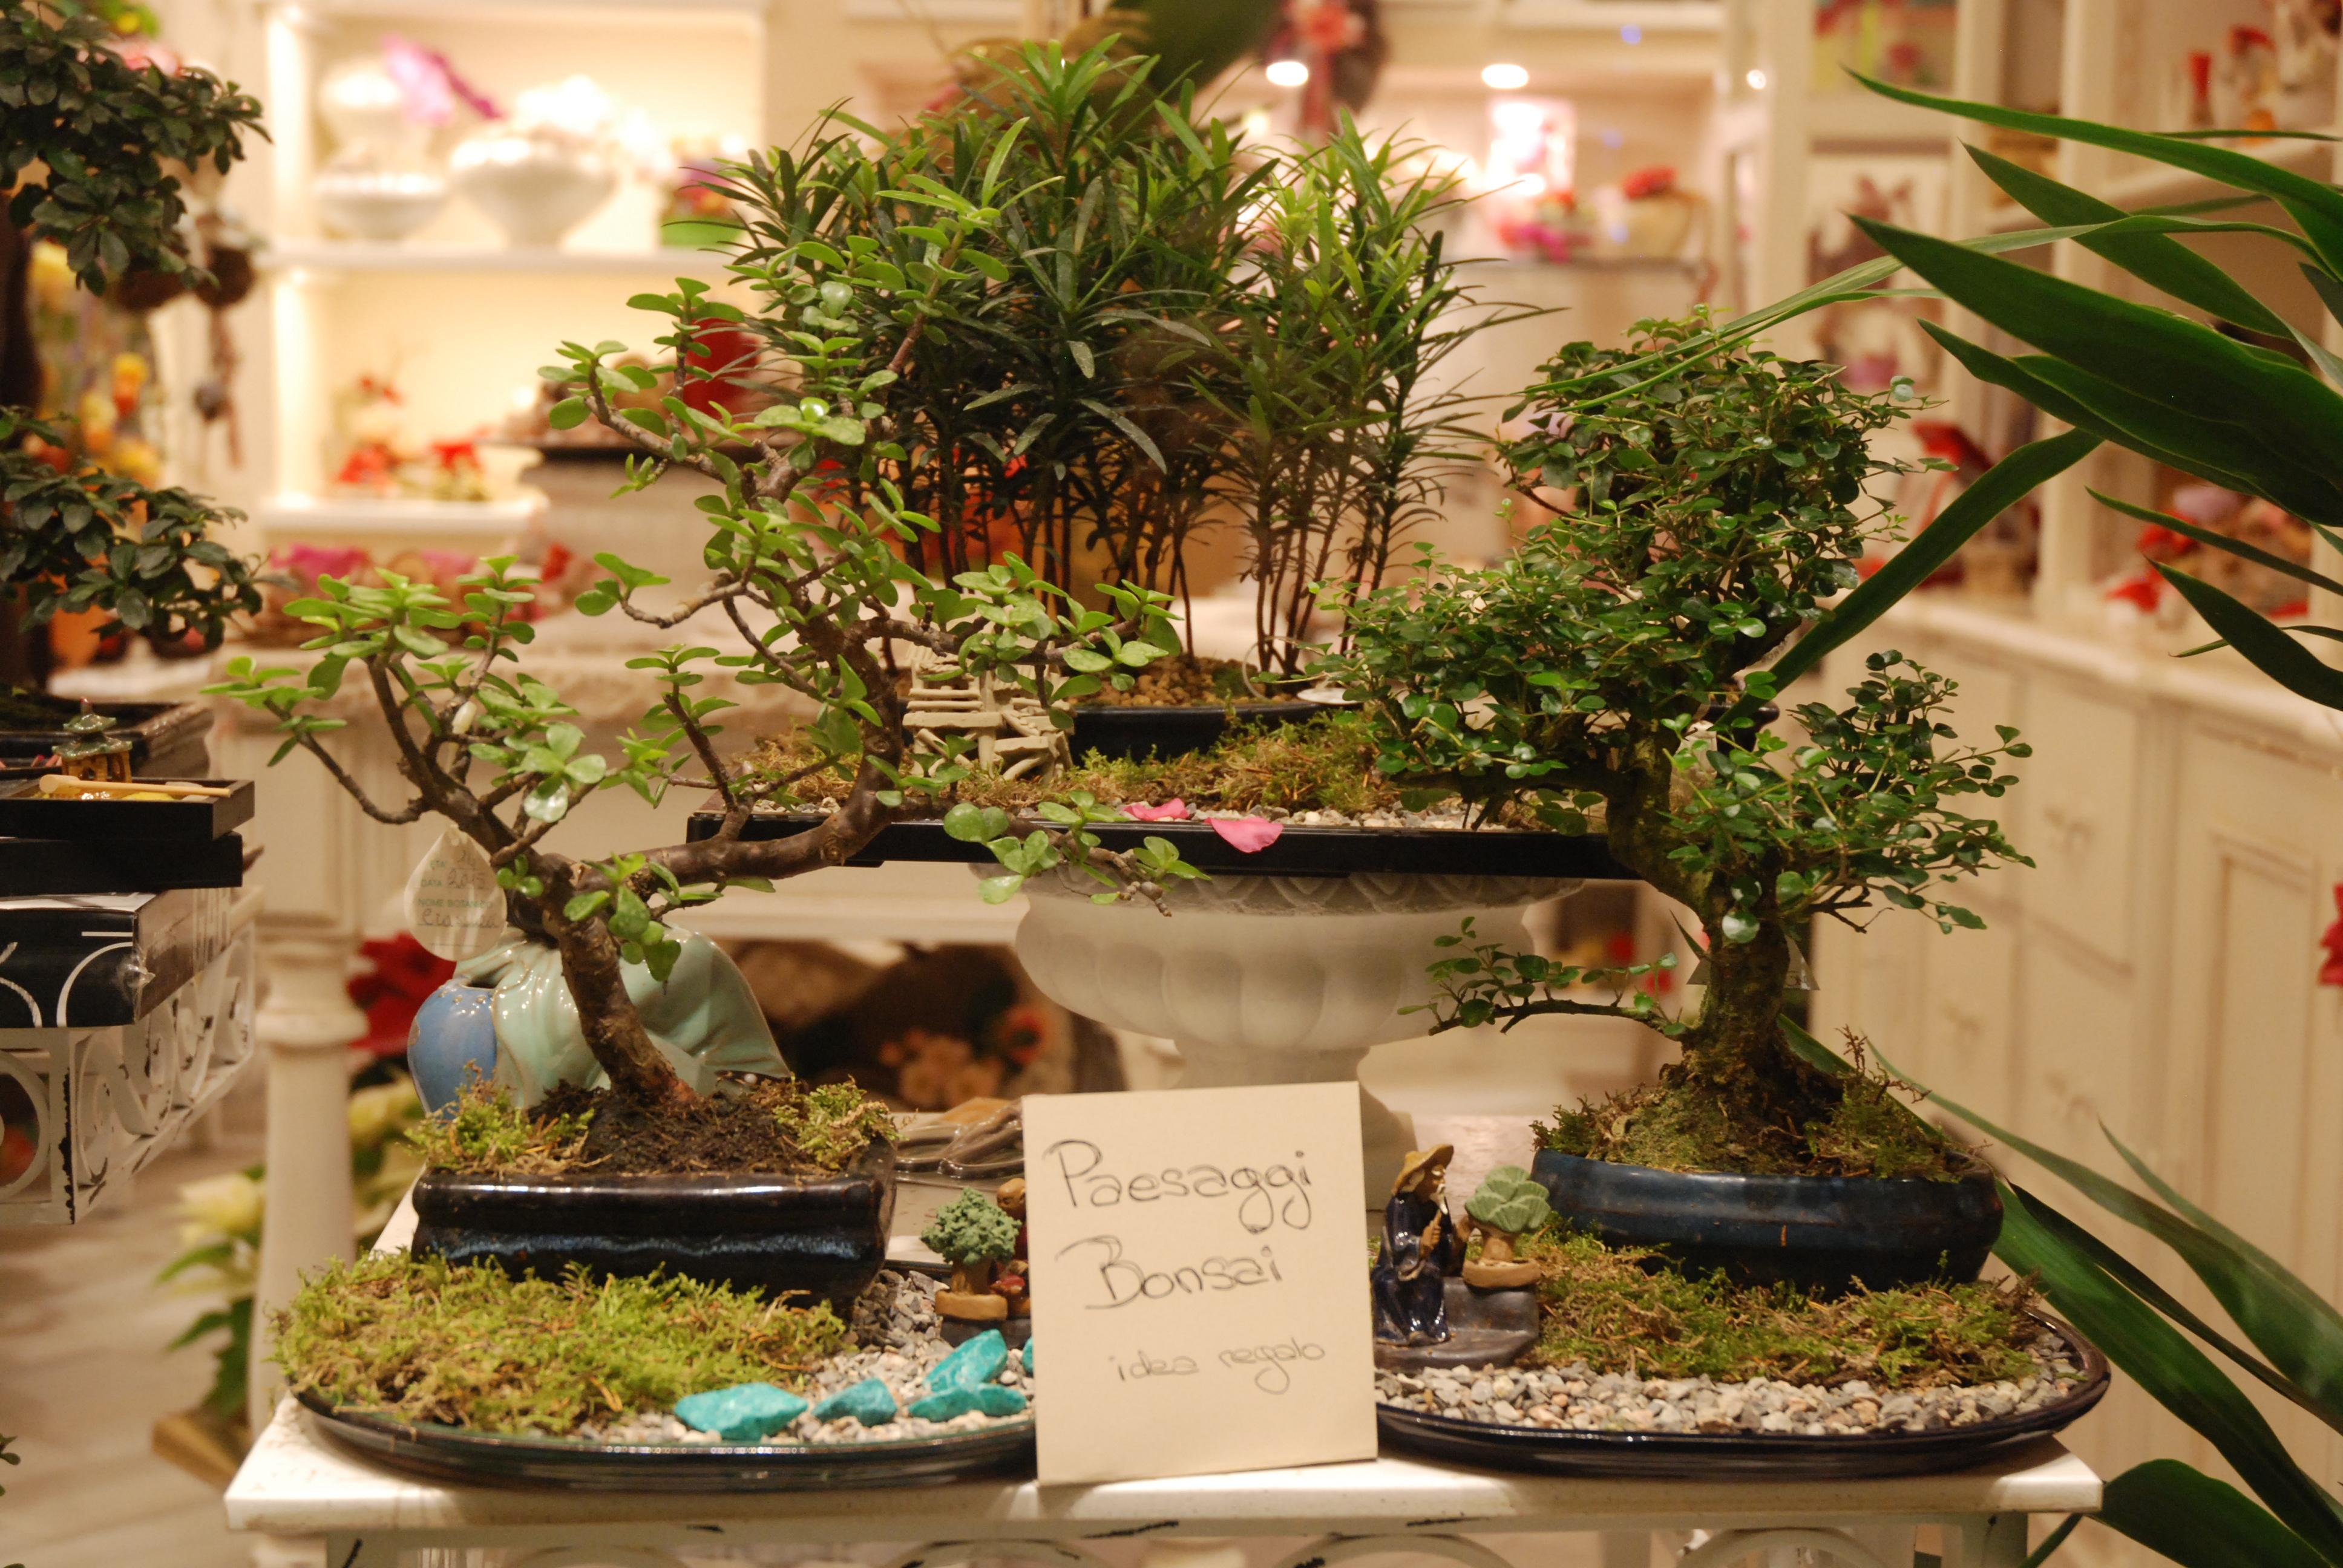 Paesaggi Bonsai